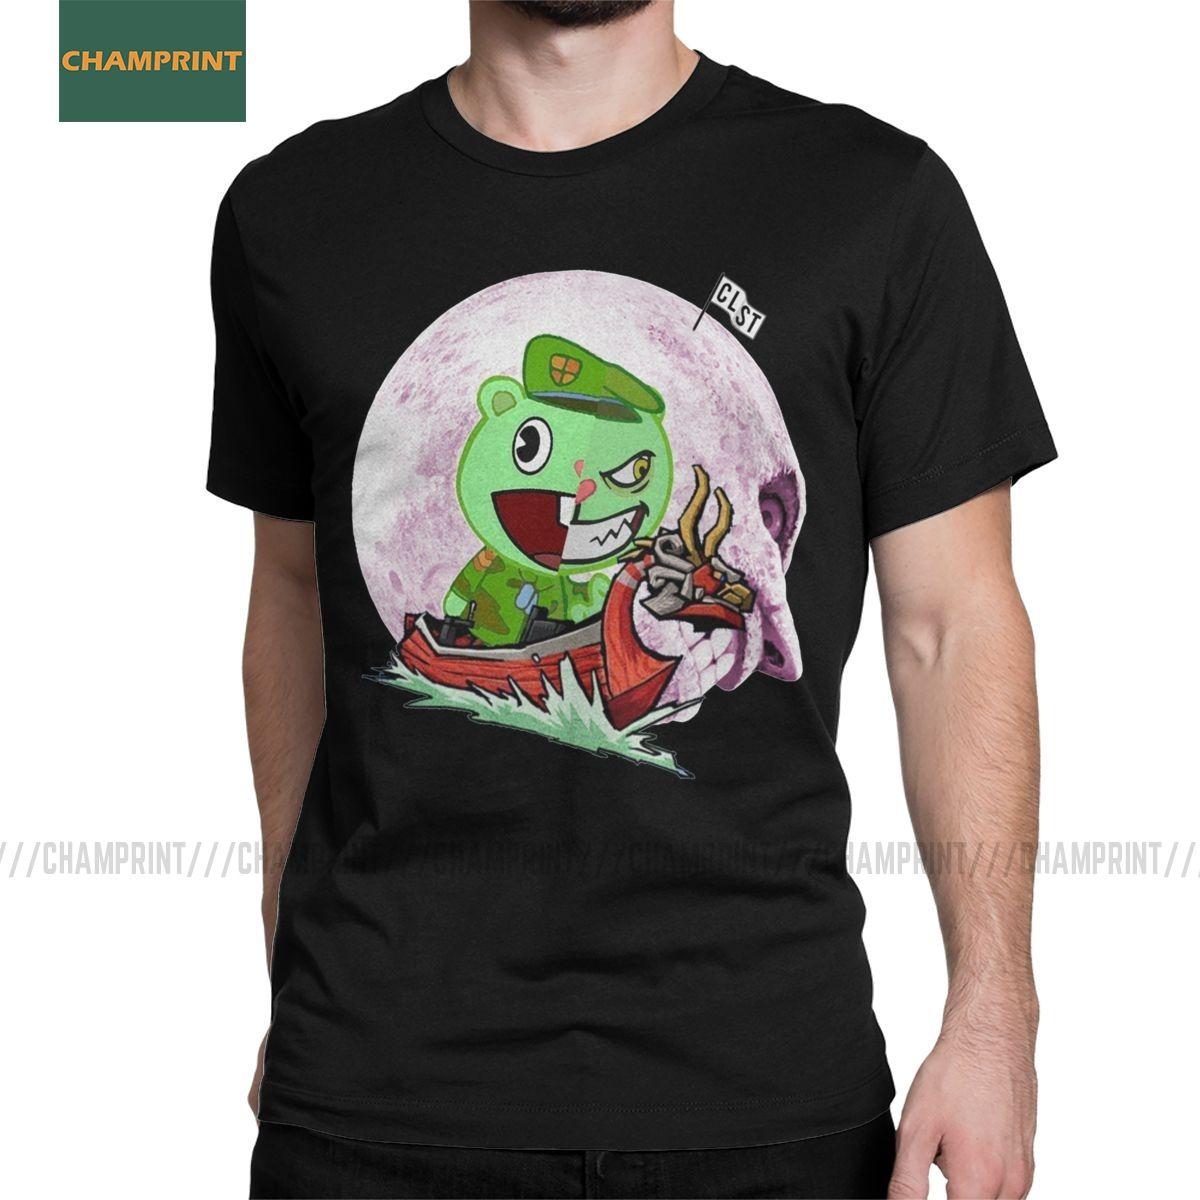 T-shirt dos homens Flippy The Wind Waker Collar Tops Happy Tree Friends Cotton Tees manga curta aberto Lumpy Petúnia Camiseta Rodada